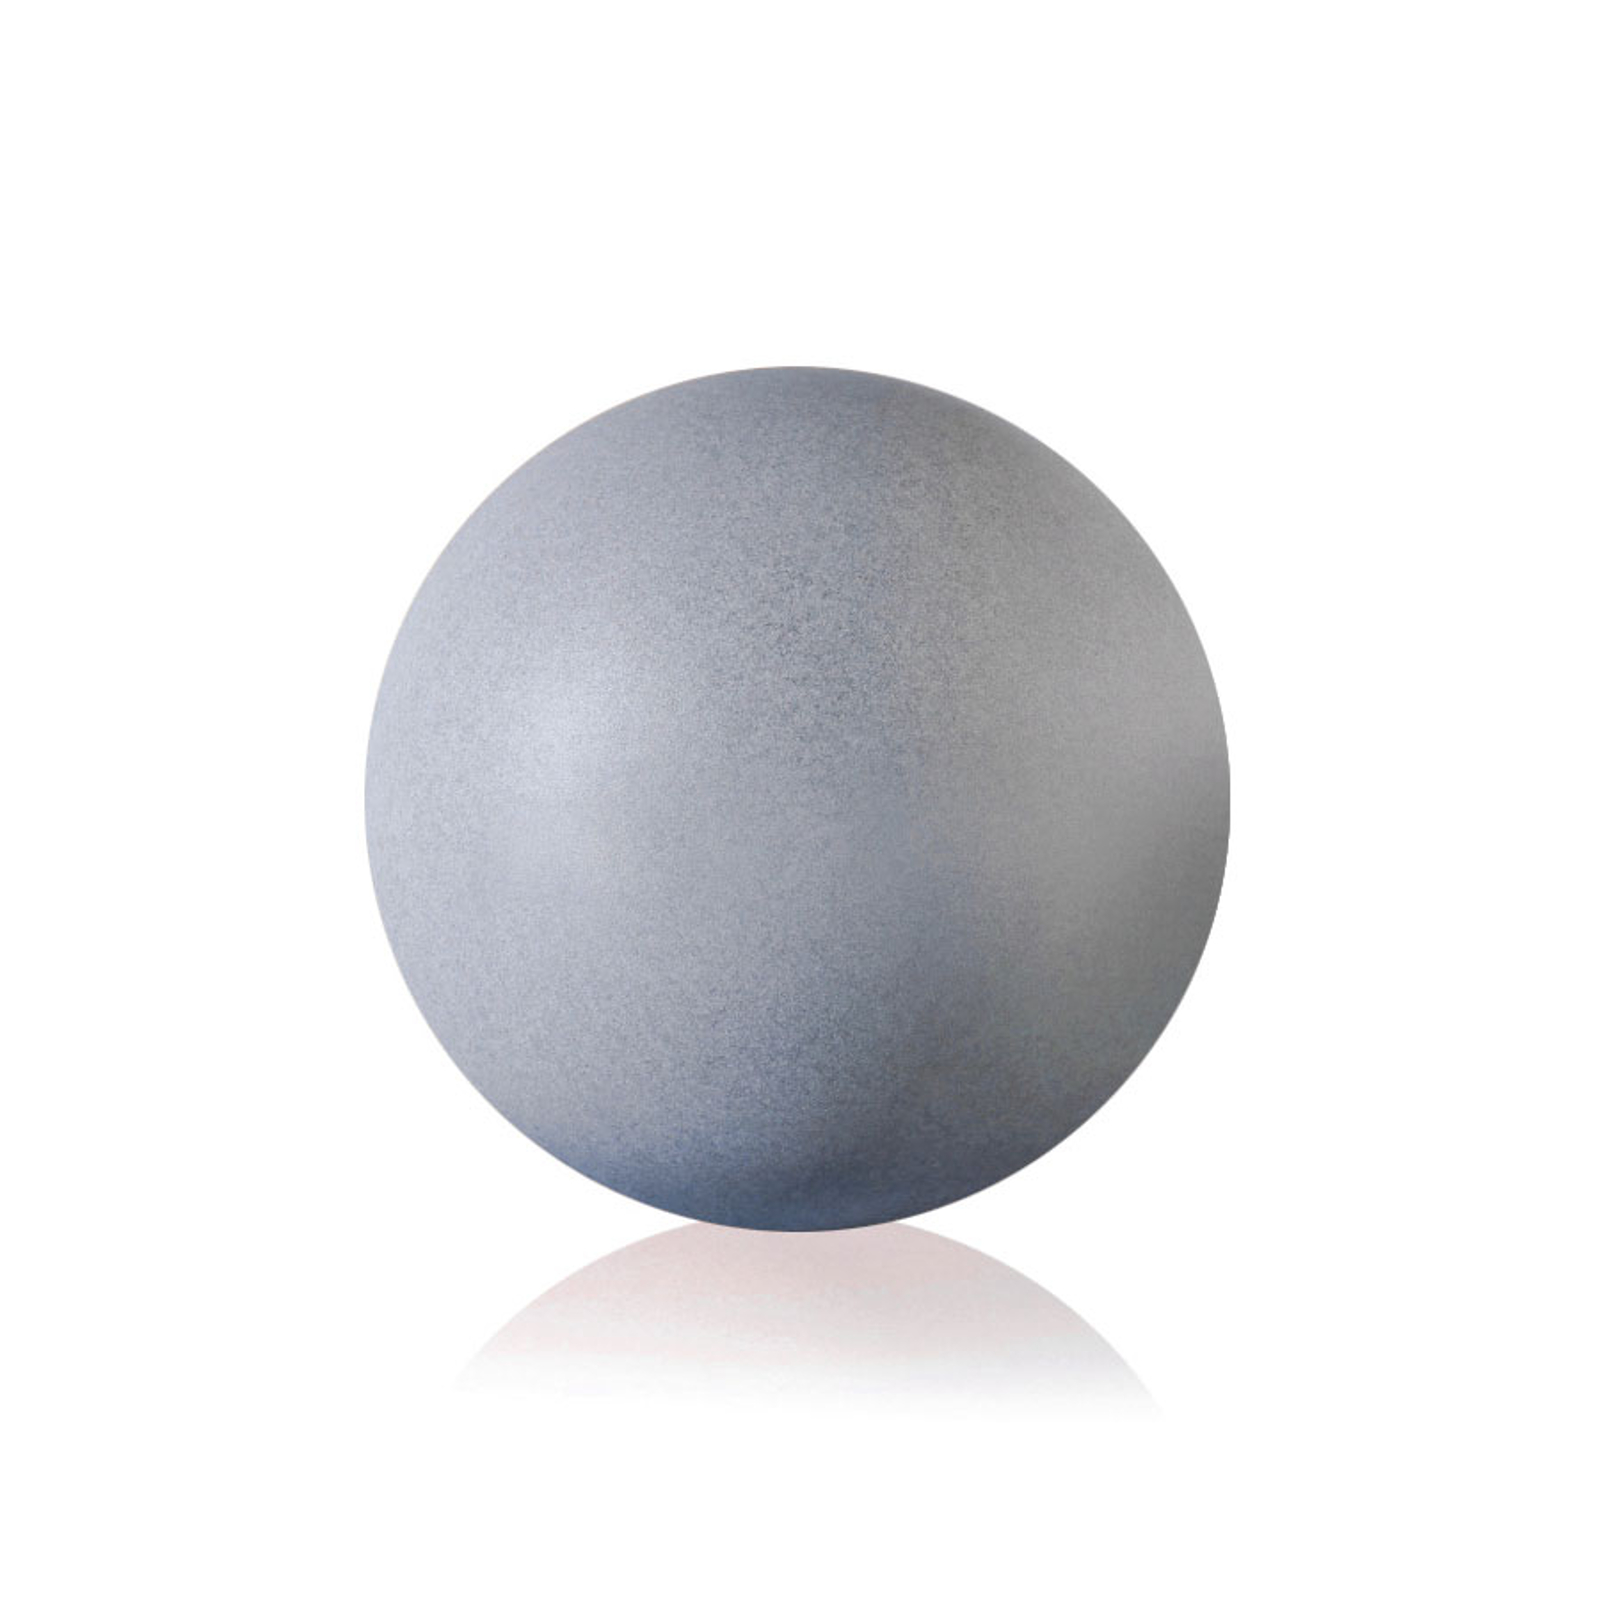 Kula solarna LED Shining Globe, kamień 30 cm